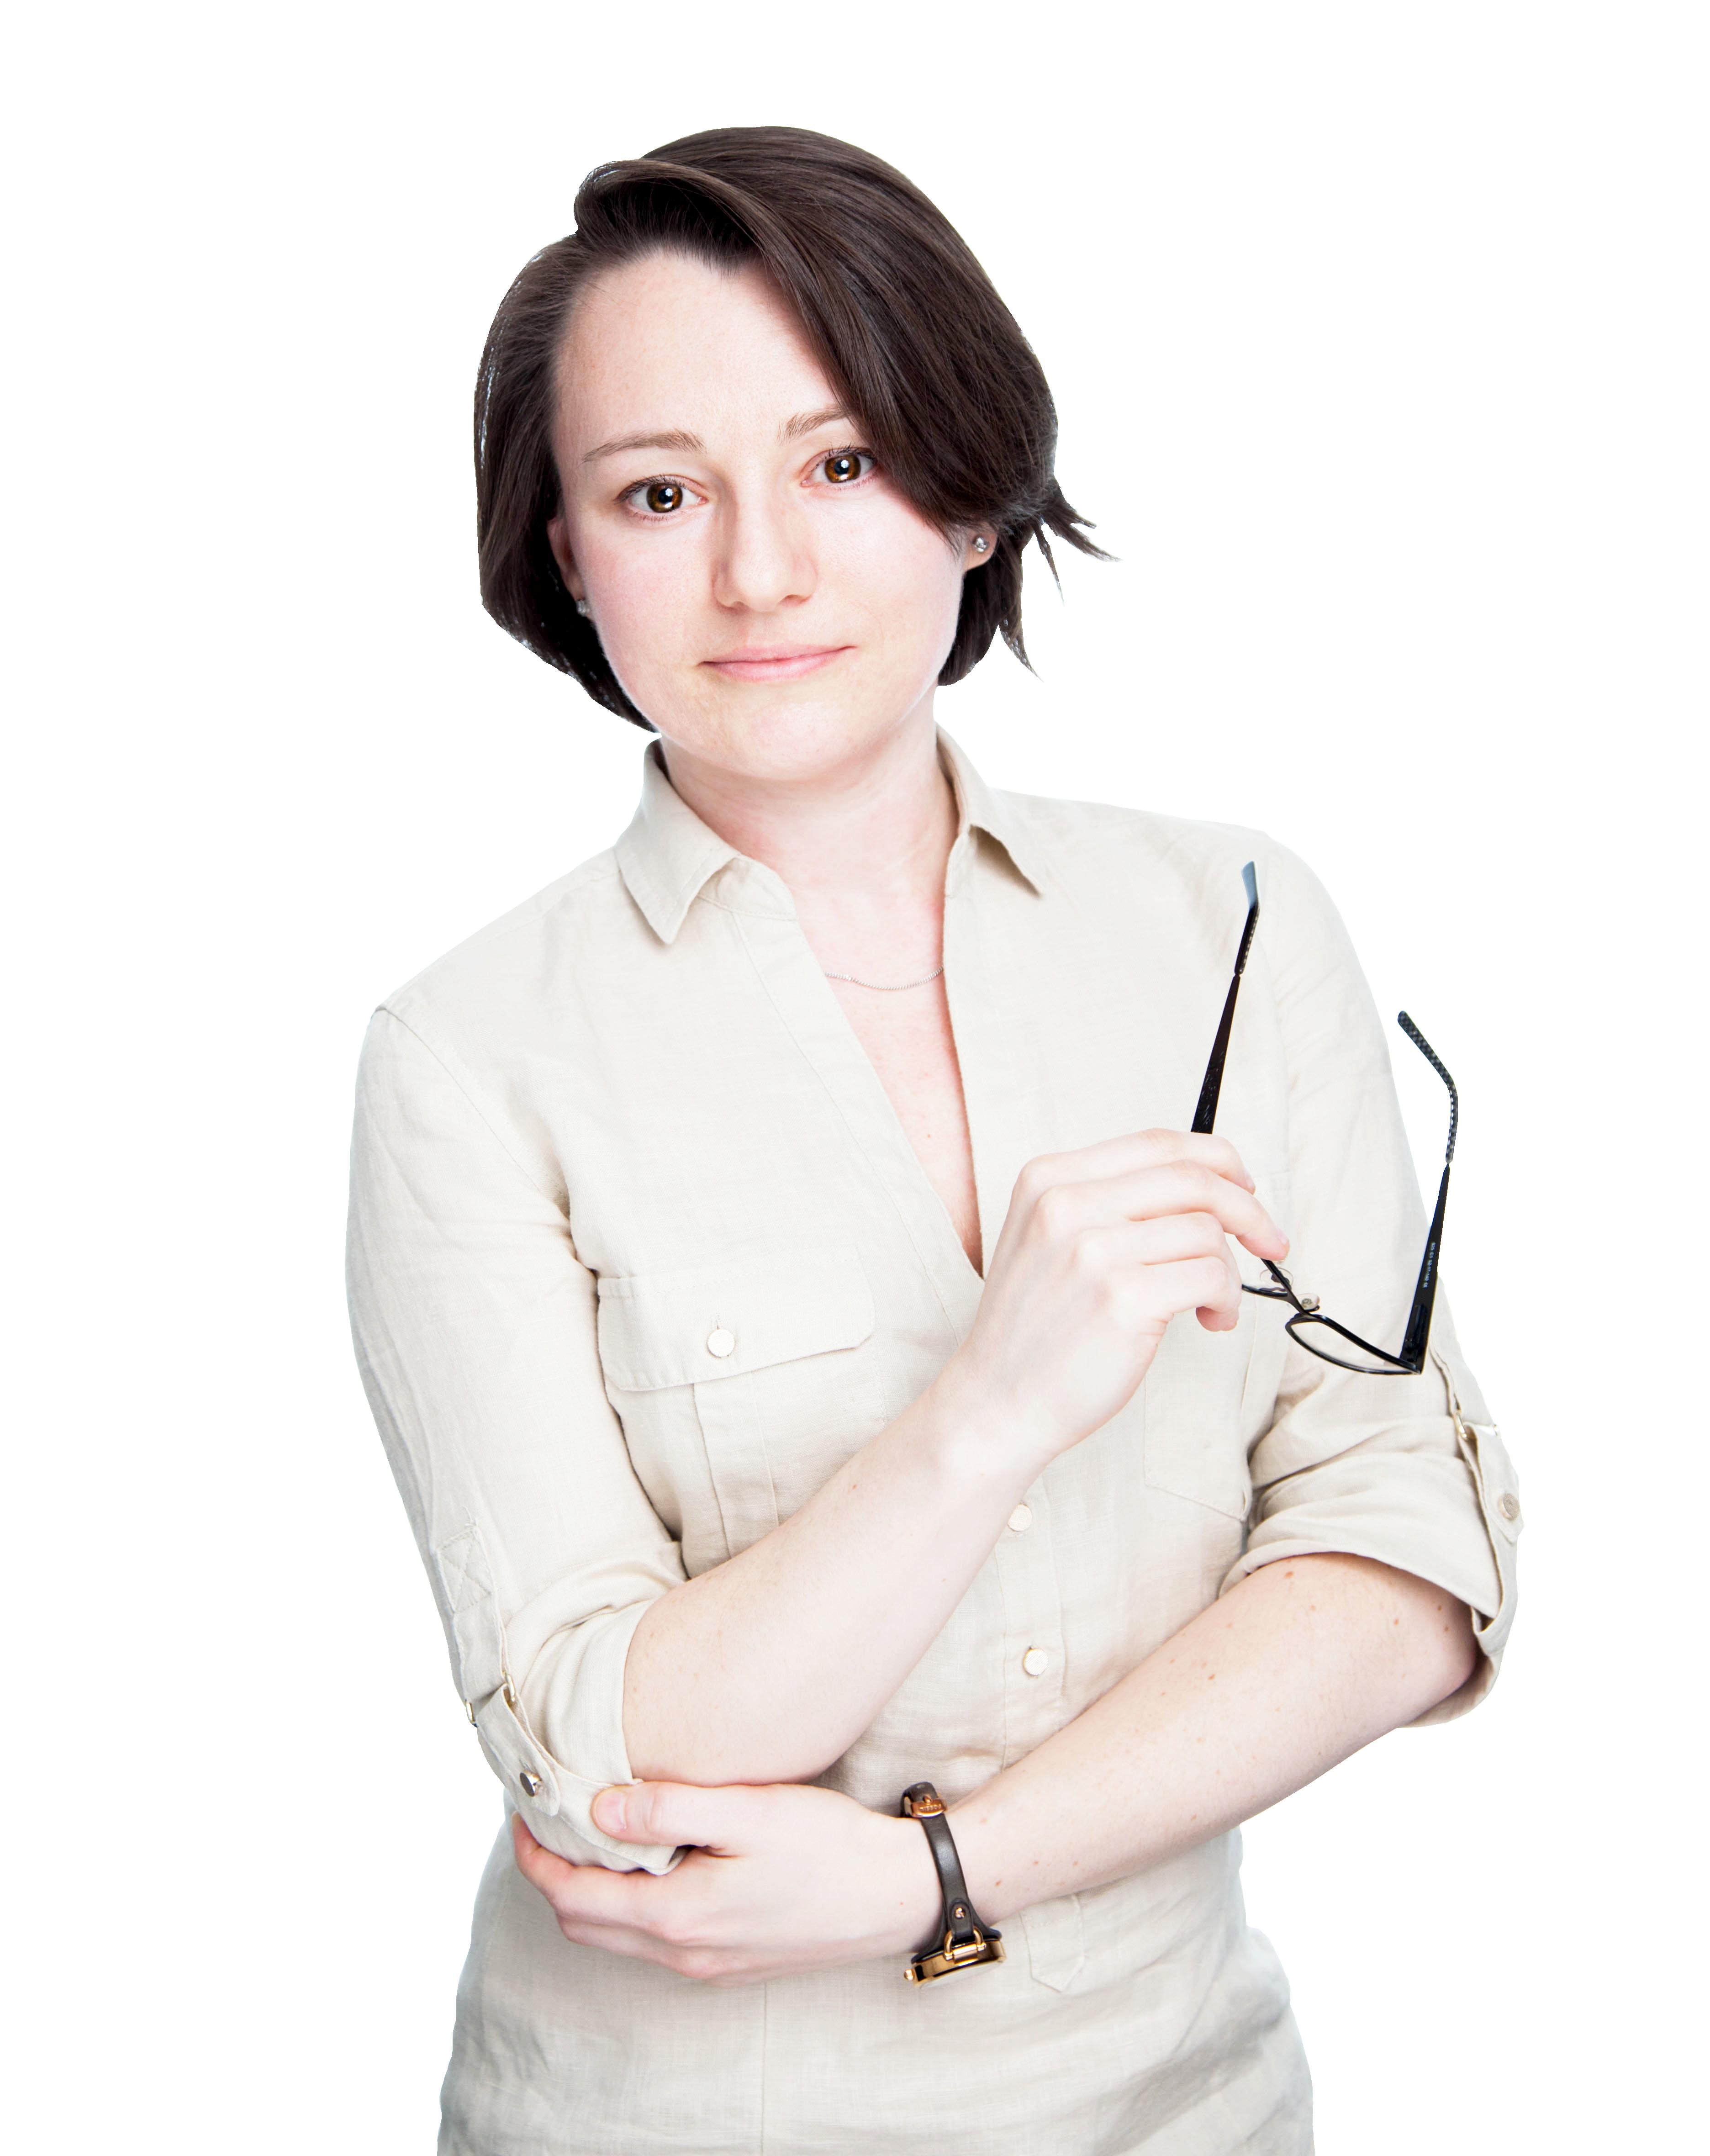 Екатерина Работягина, редактор портала Про-госзаказ.ру